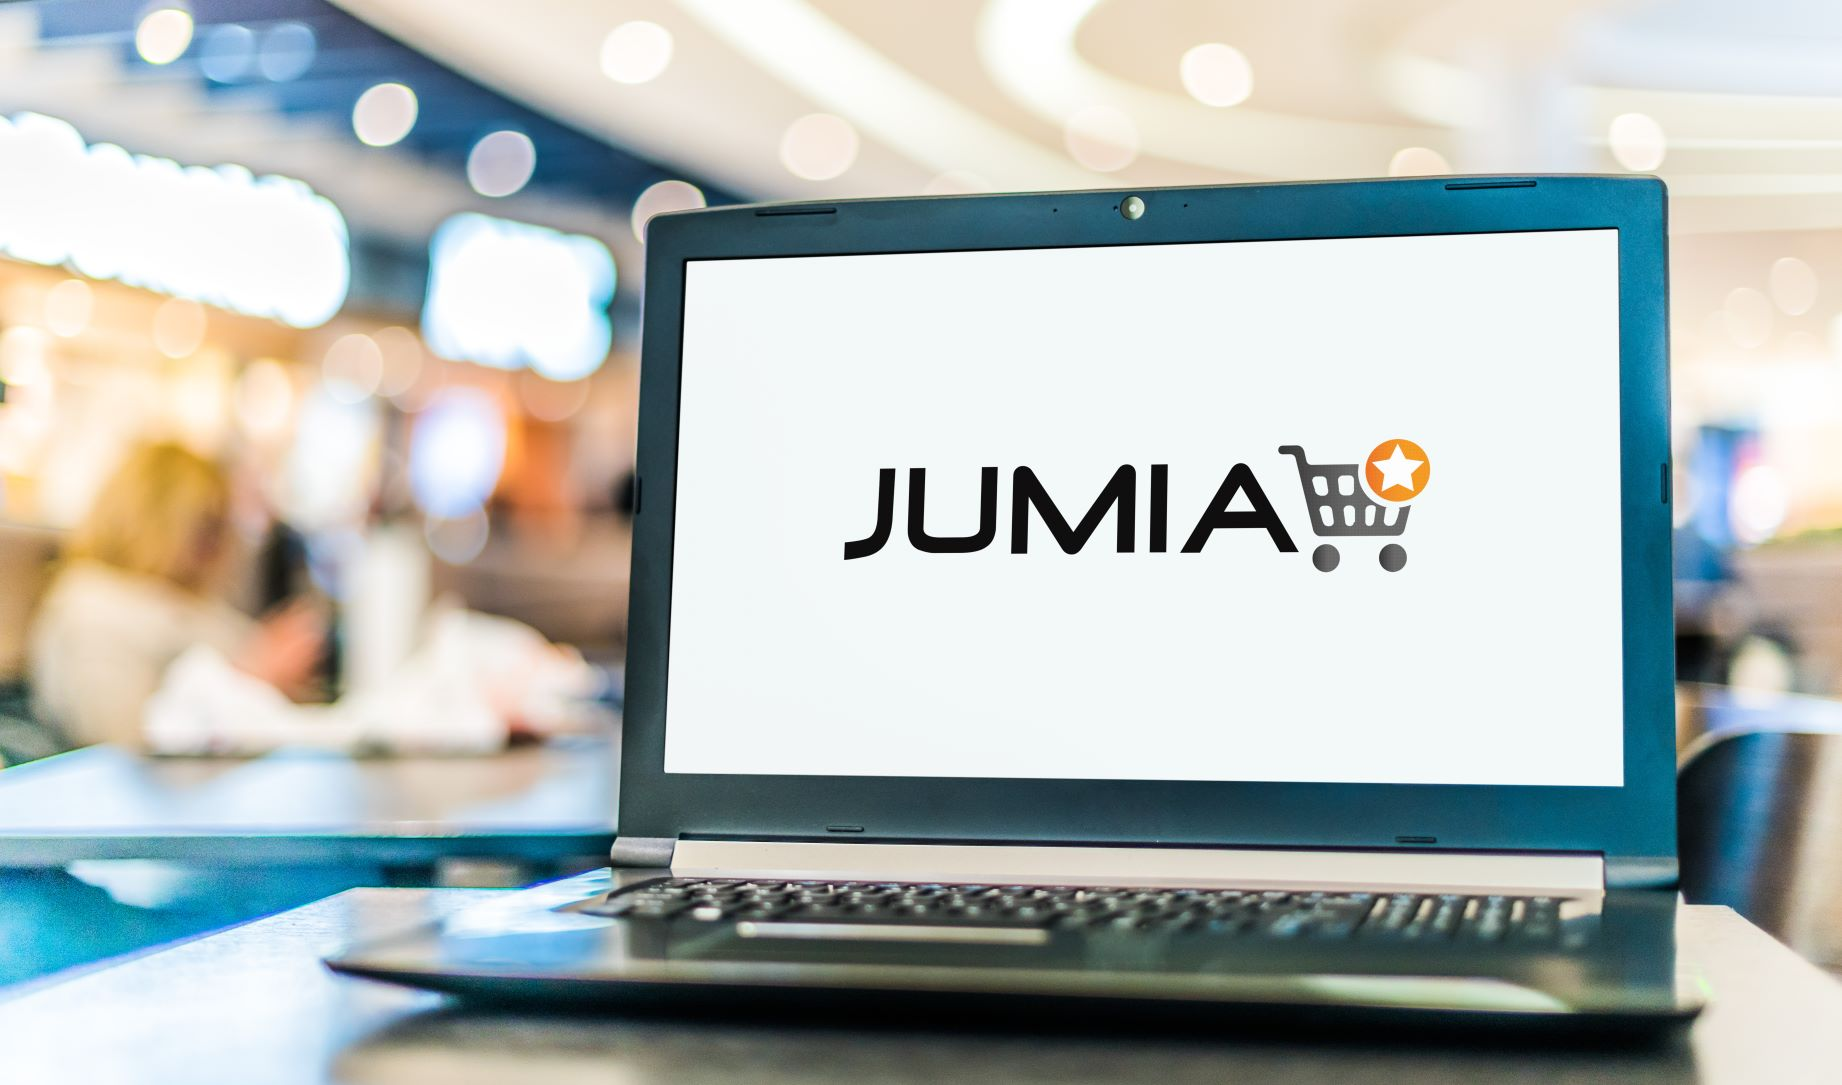 Jumia: Q2 results should signal GMV surge; Buy